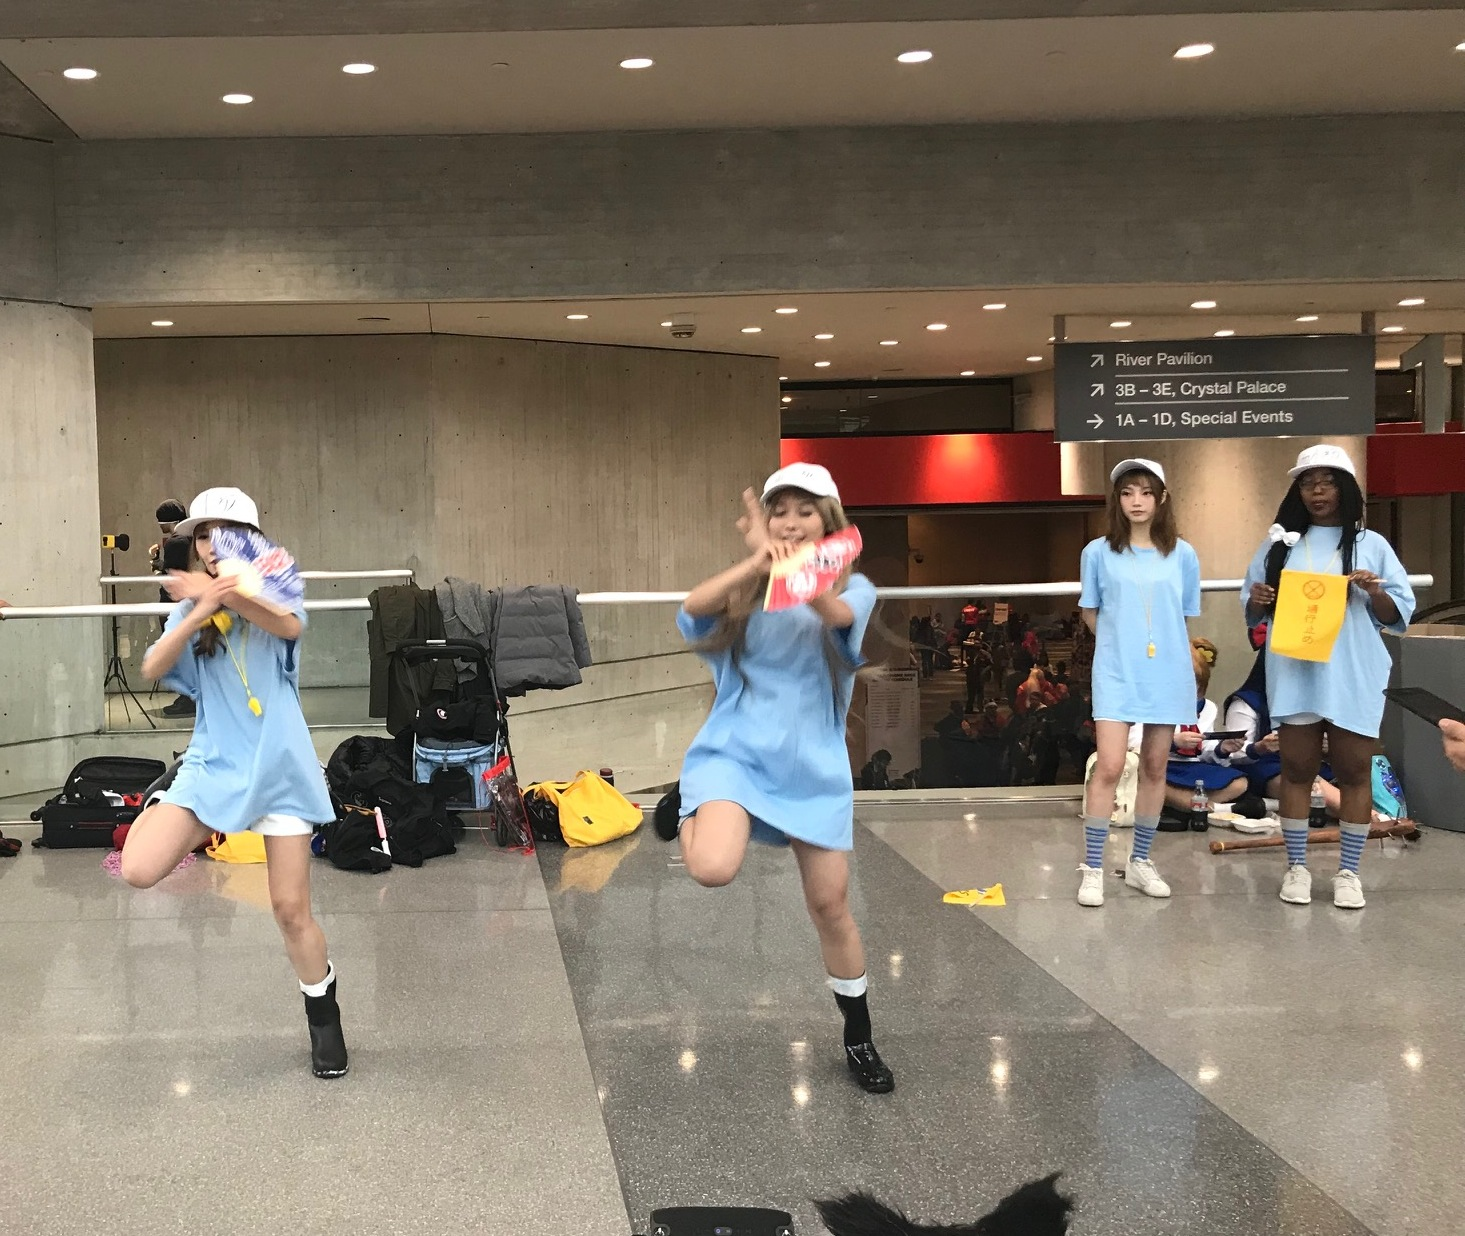 Maid 4 U Cafe Dancers performance.